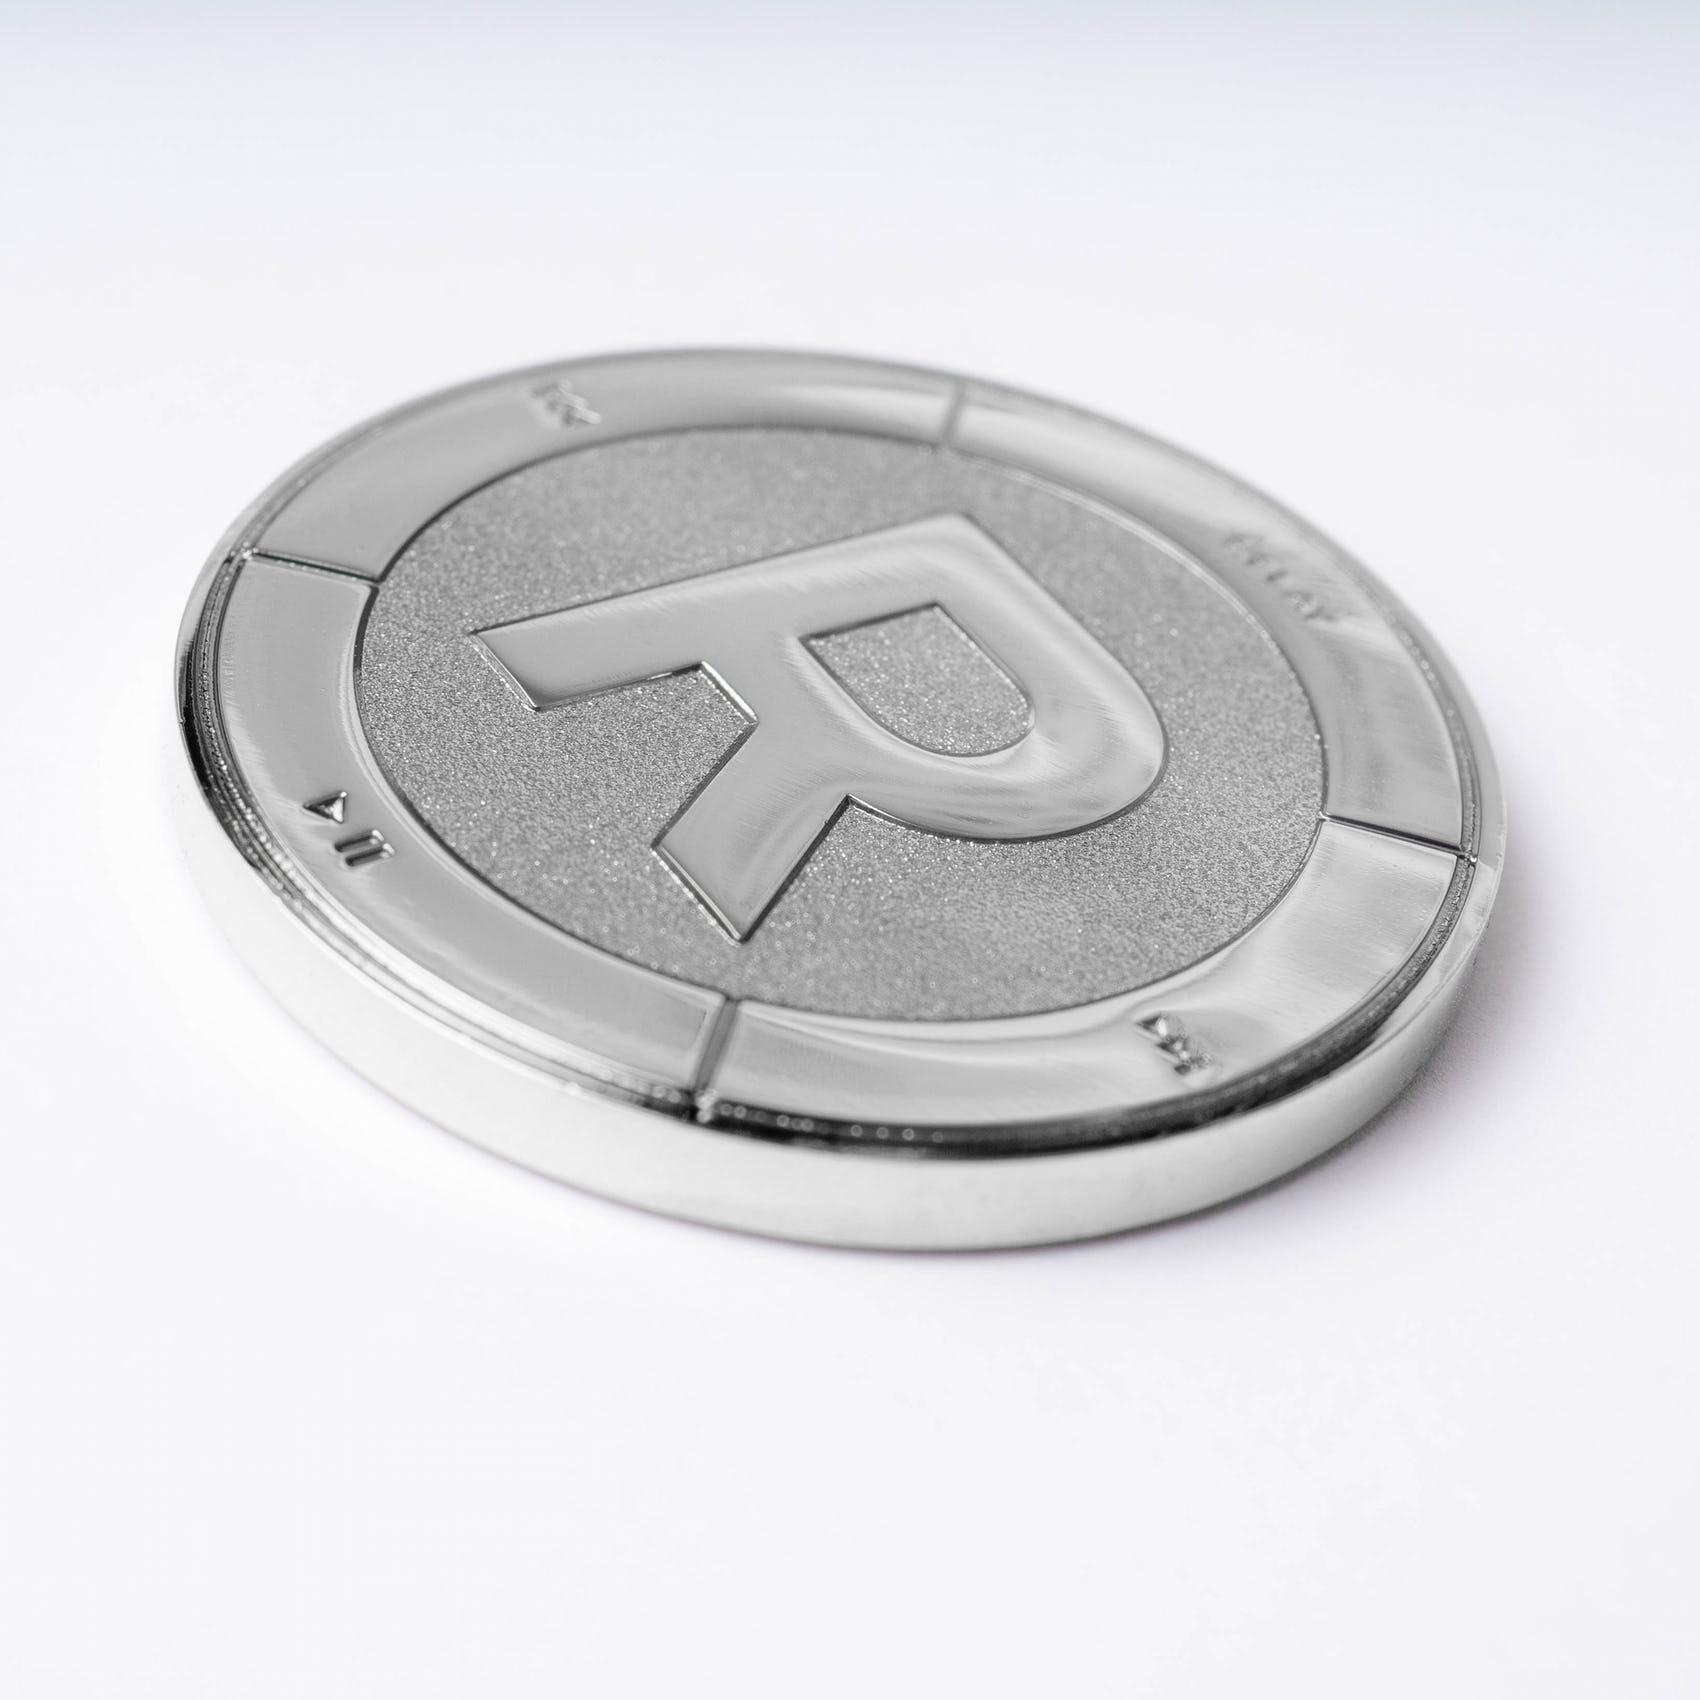 relayfm18_coin_back.jpeg